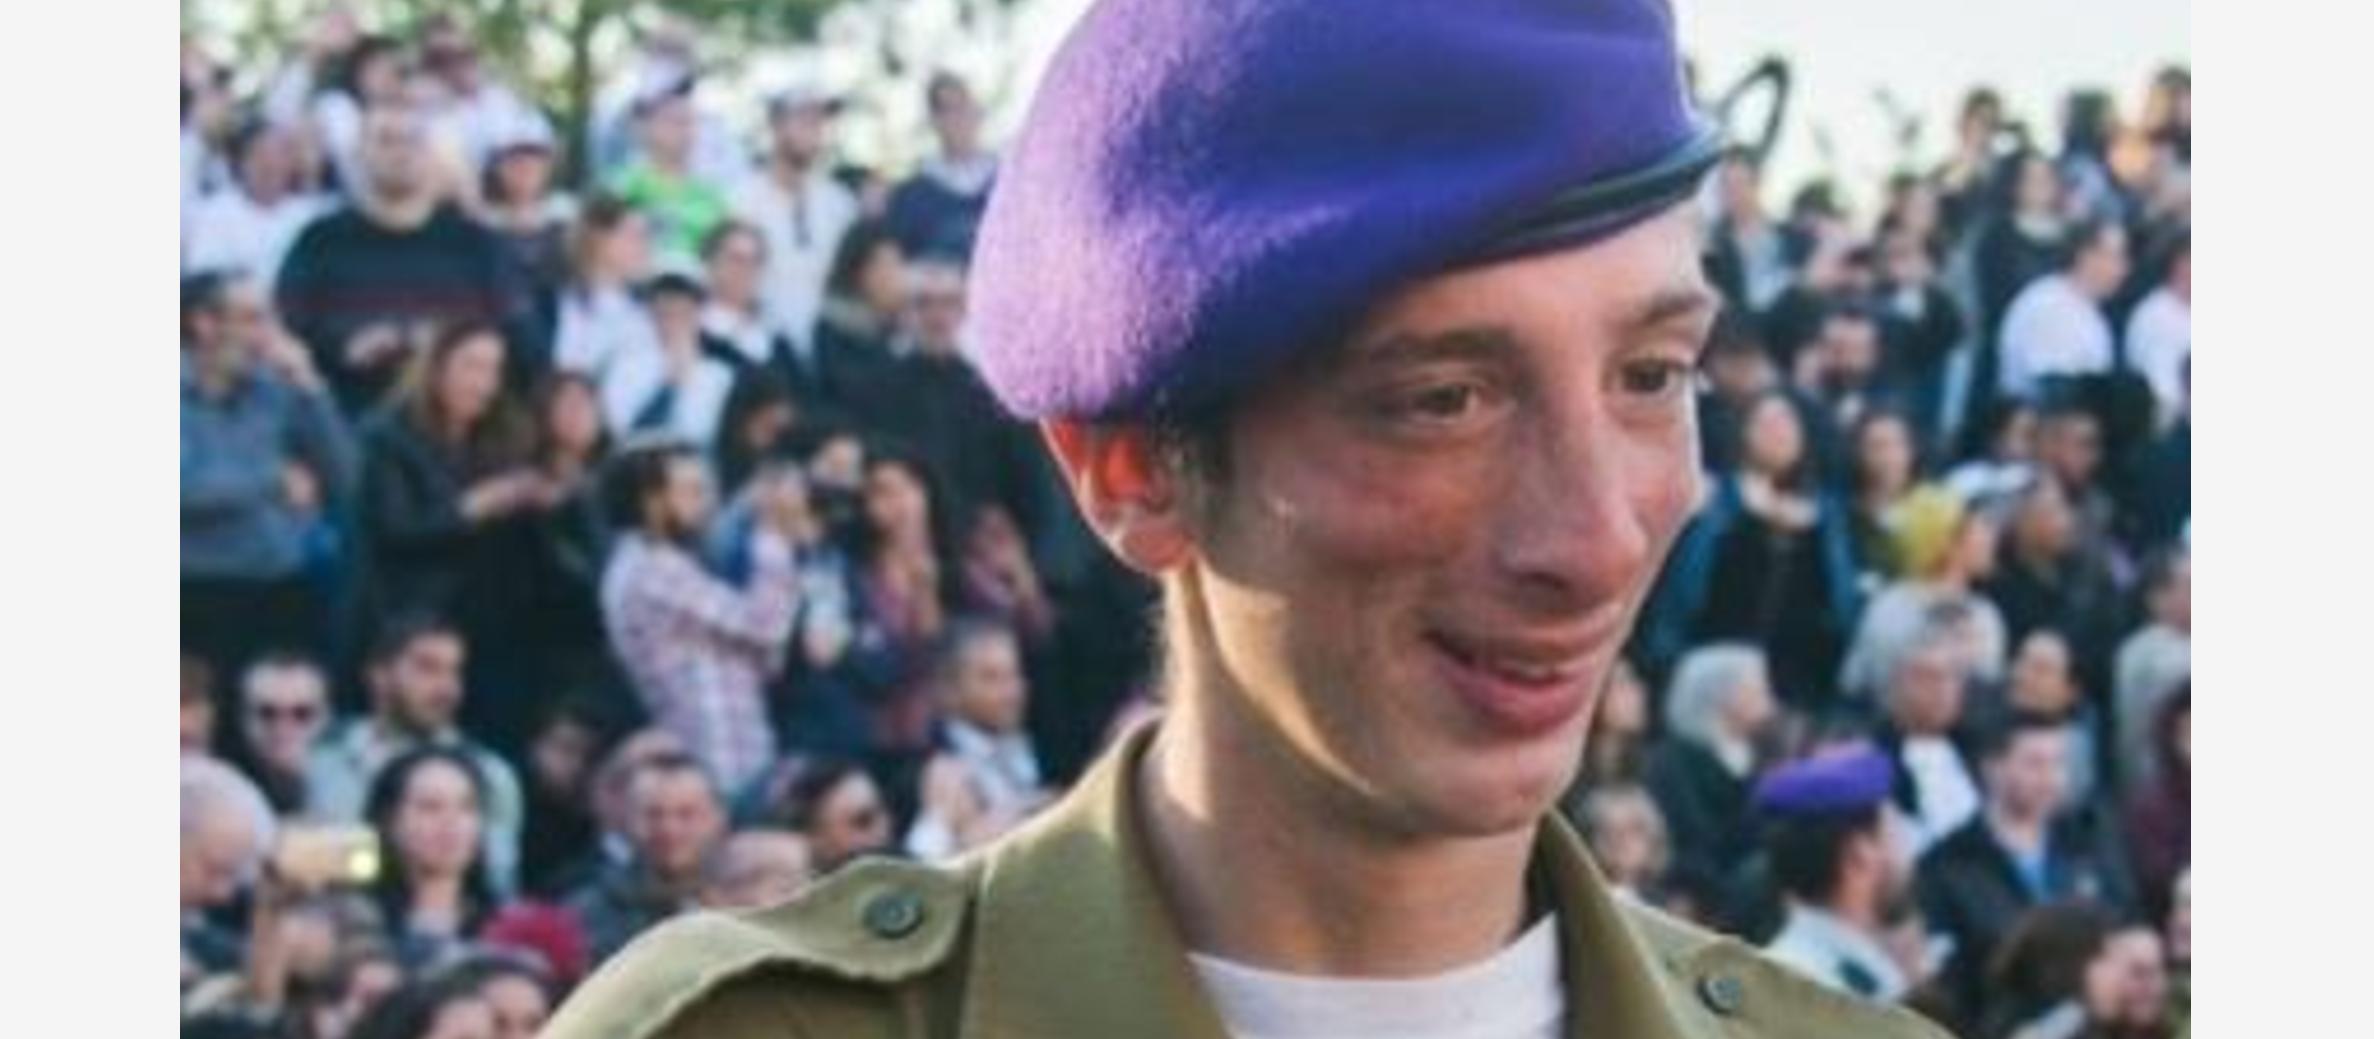 Survivor of anti-Semitic stabbing in France joins elite IDF brigade